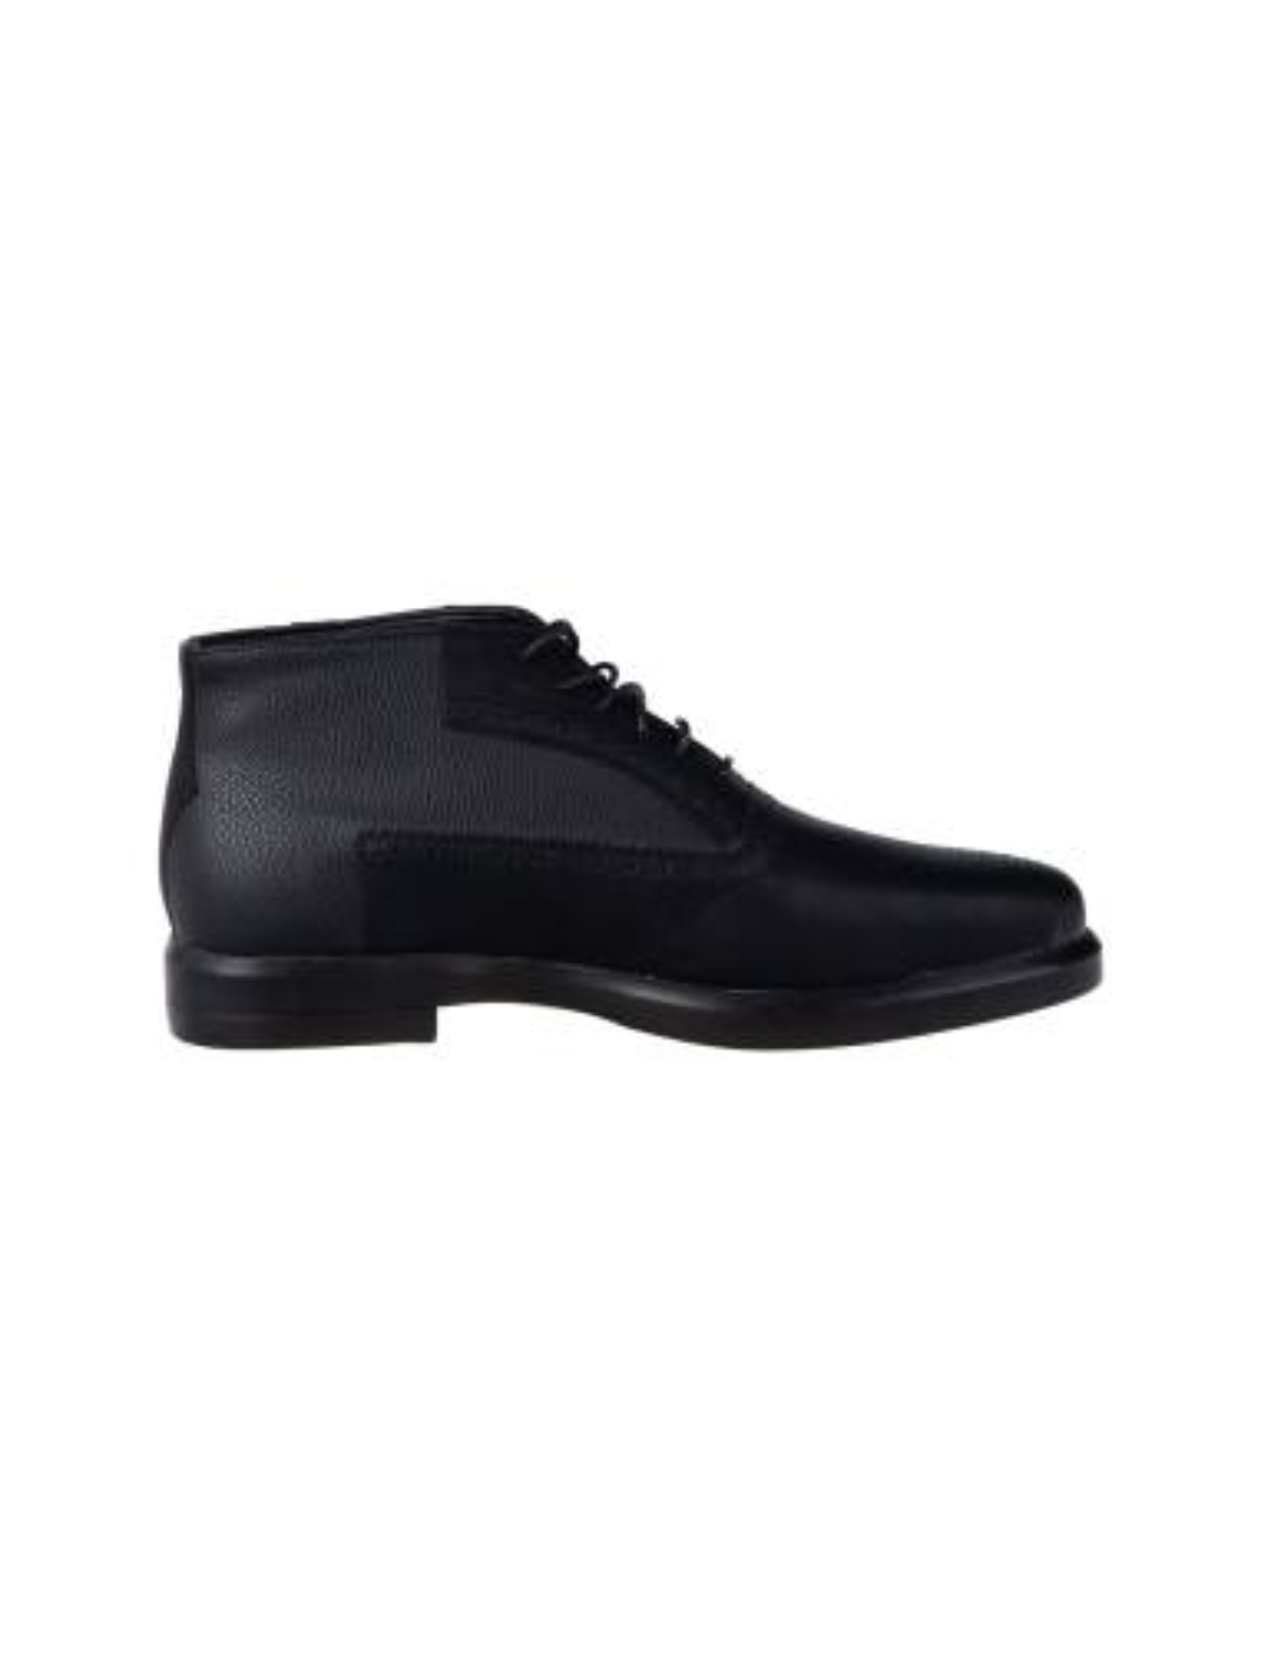 کفش تخت روزمره مردانه